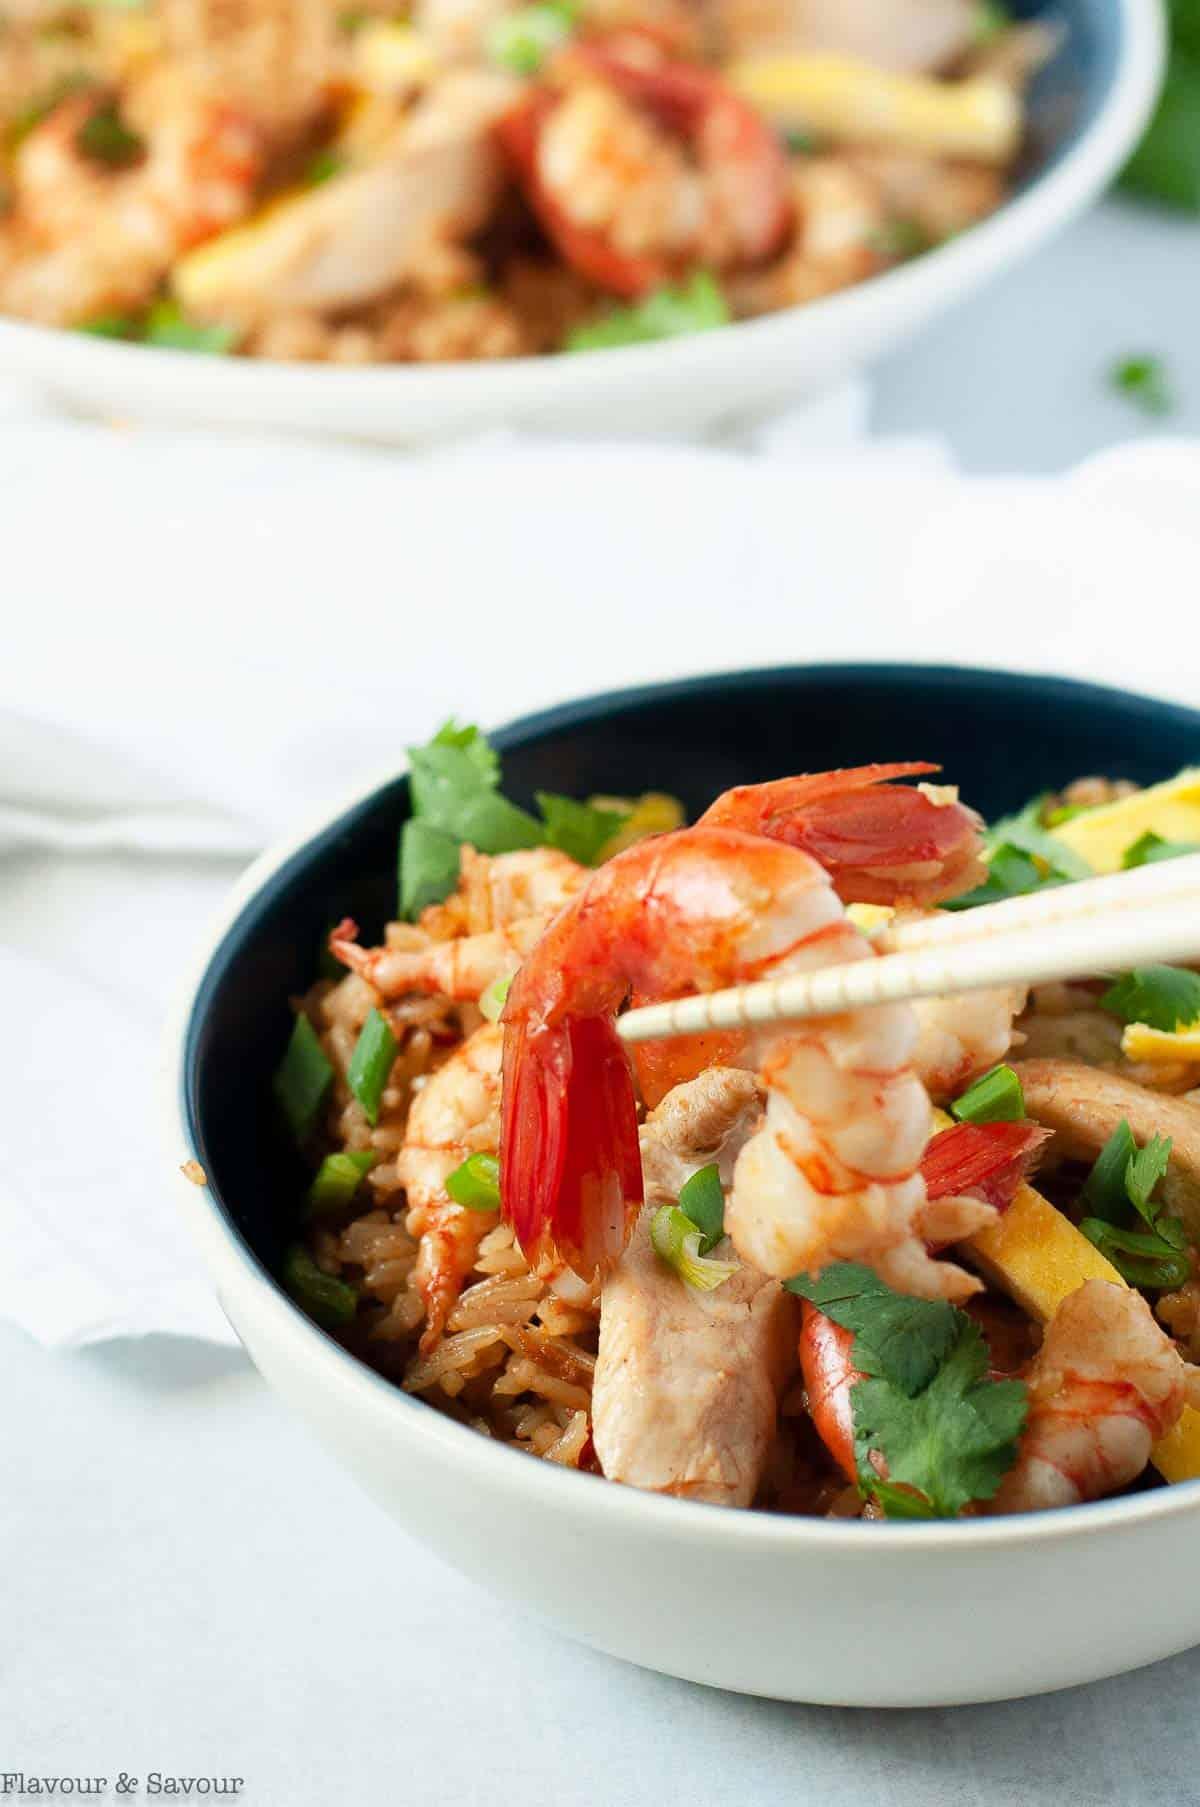 Close up view of a prawn with chopsticks from a bowl of Nasi Goreng